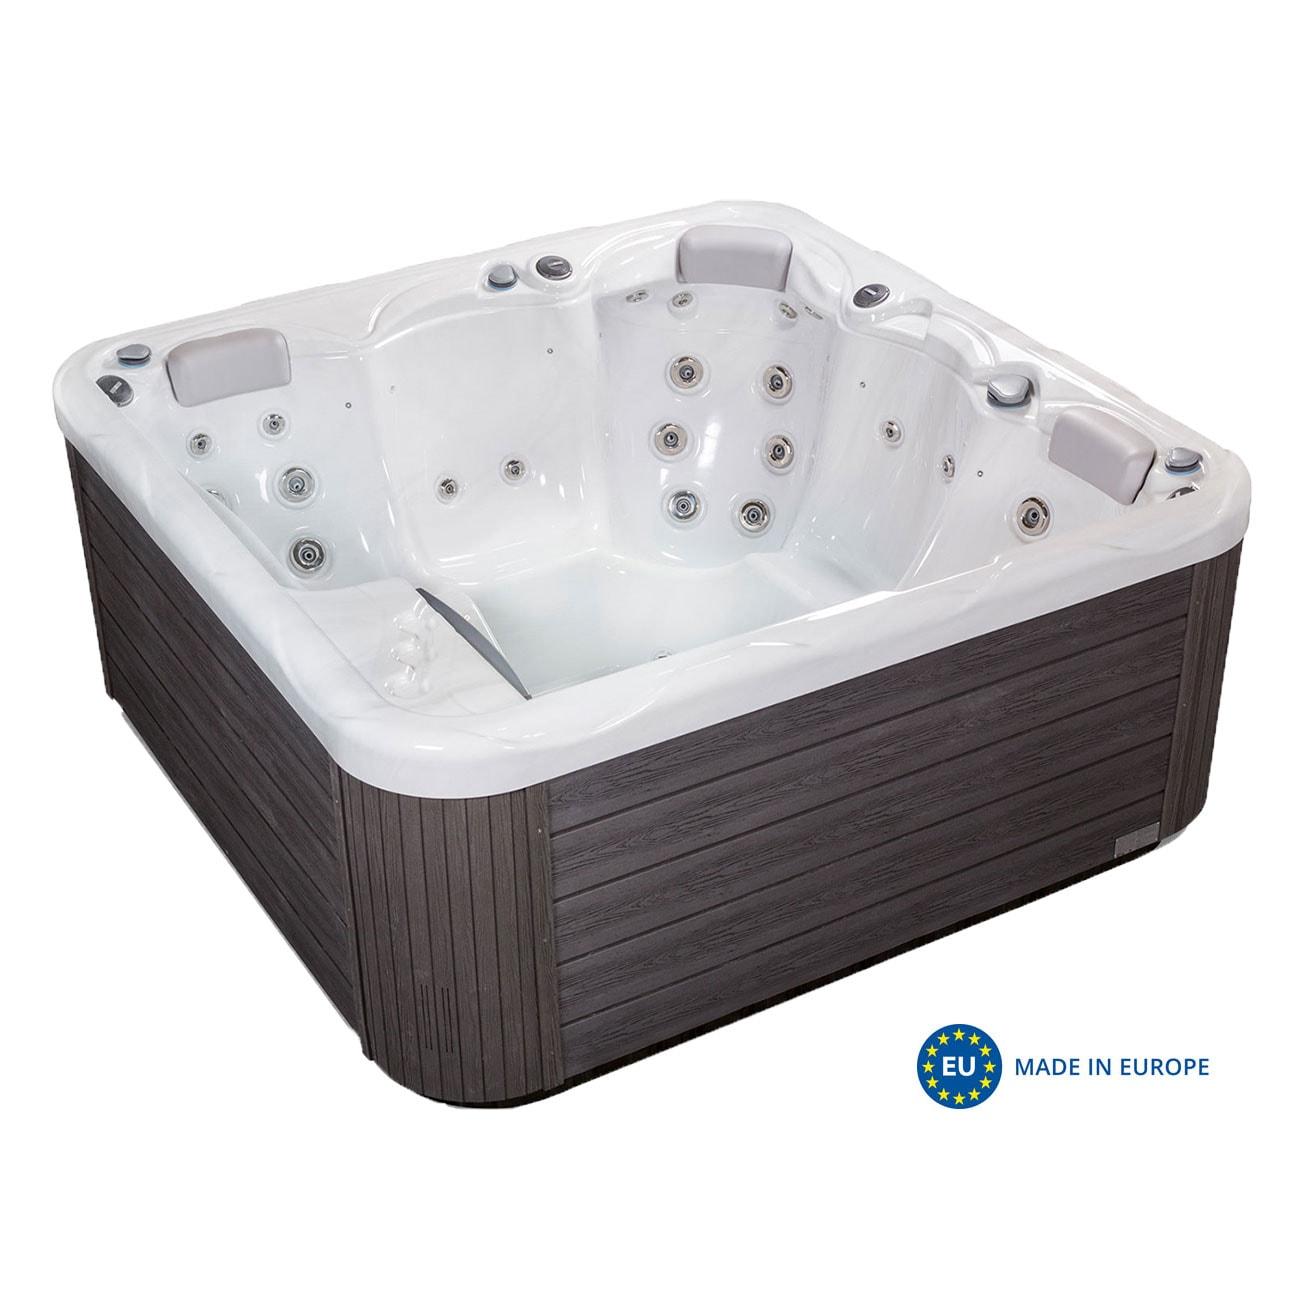 Top-Angebot: Whirlpool FlexLine Kos